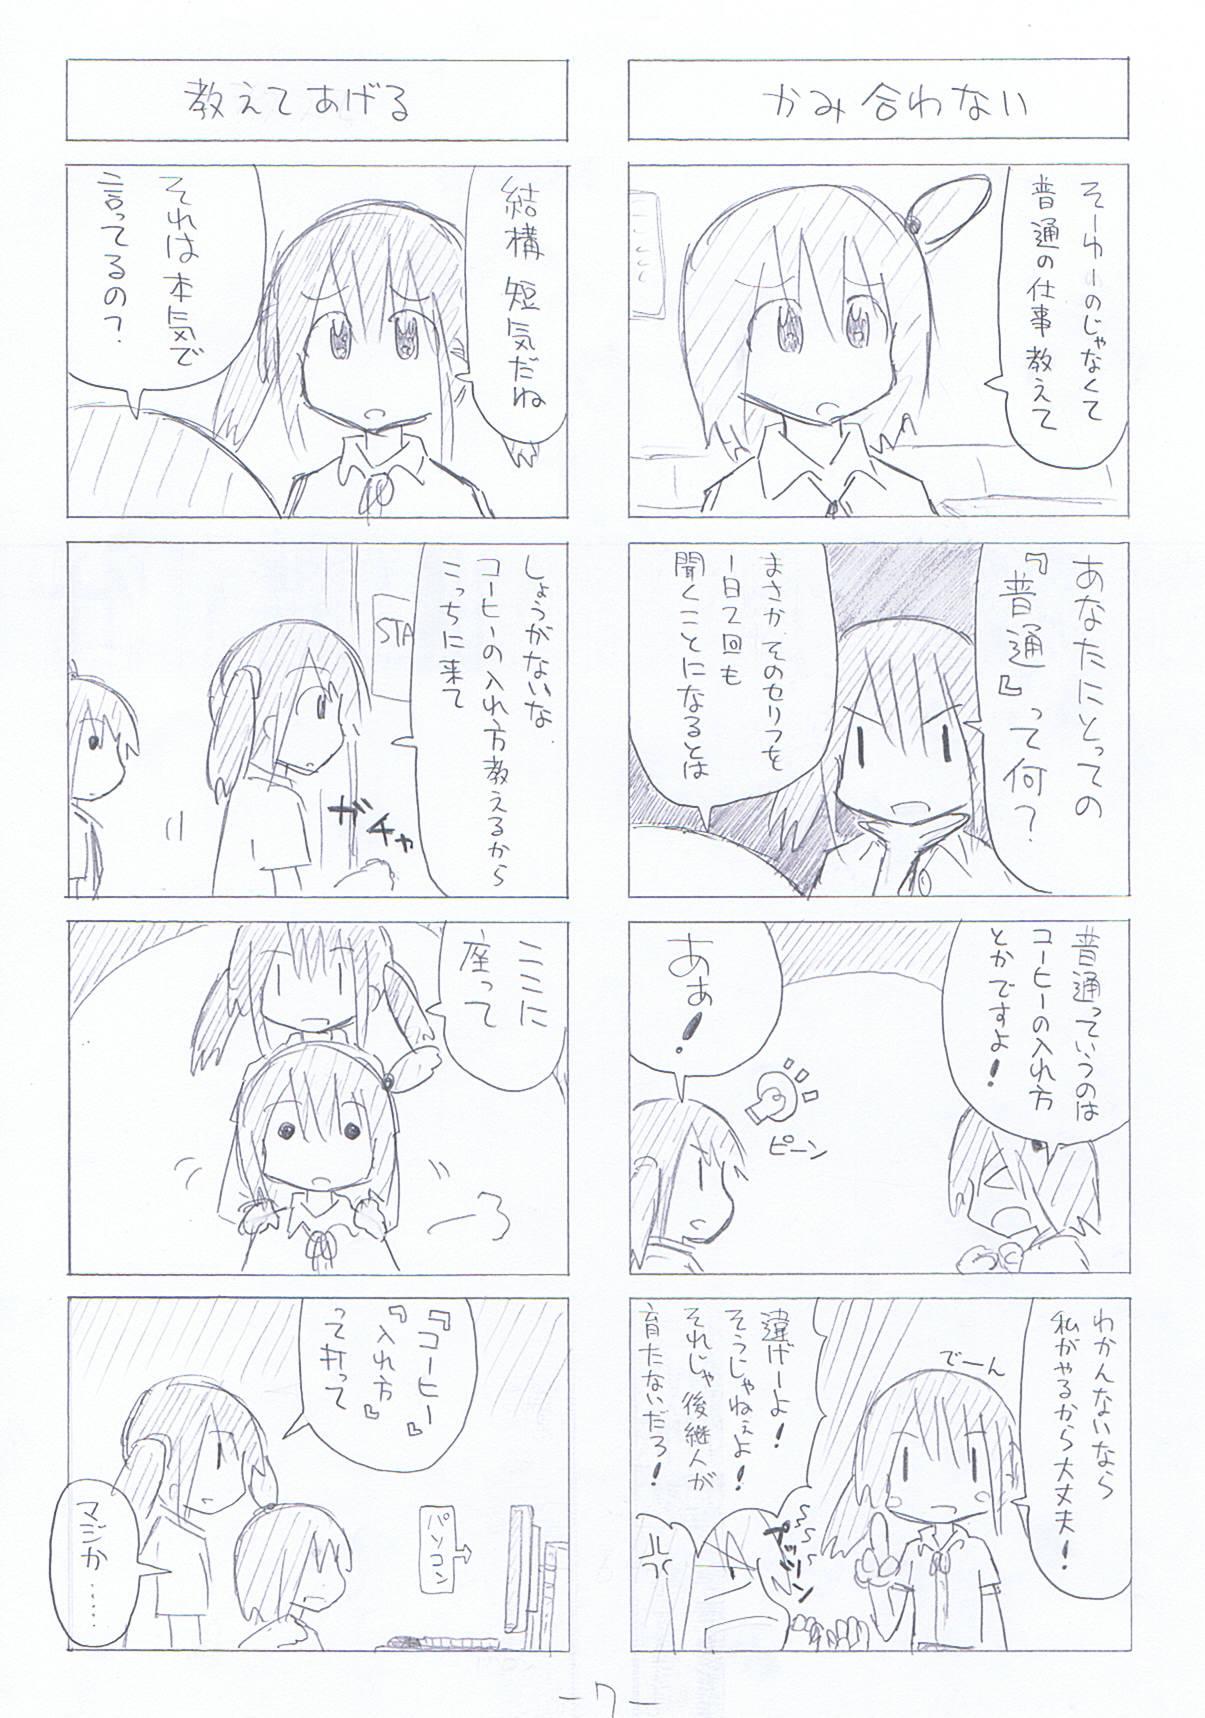 hitotoki-1-7.jpg